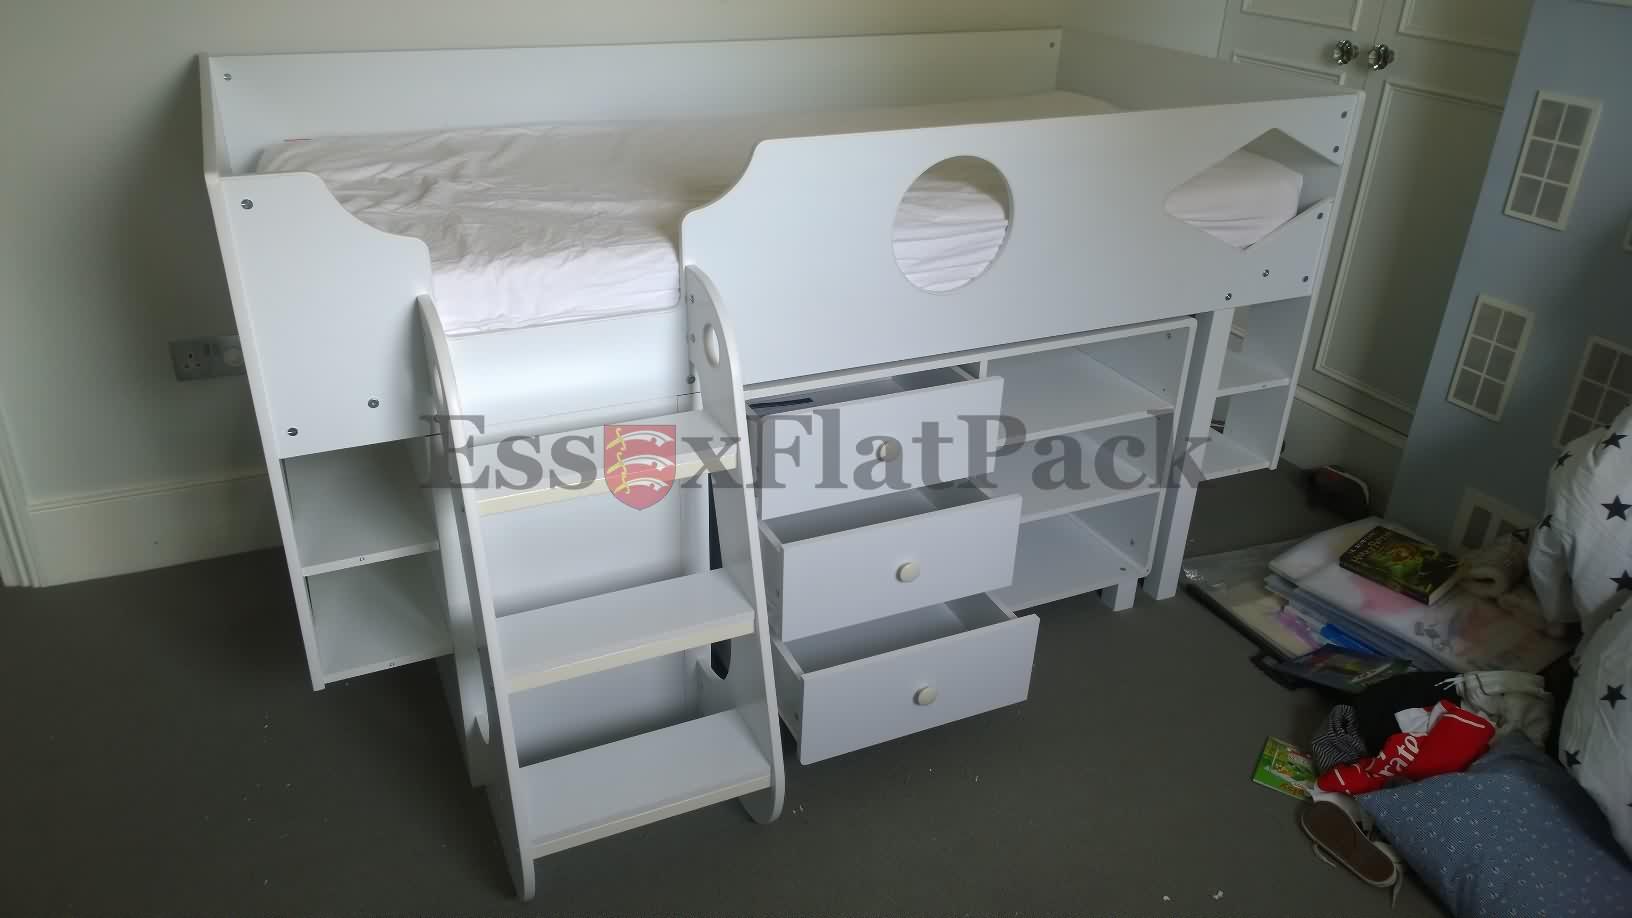 essexflatpack-cabin-bunks-20150718154402.jpg